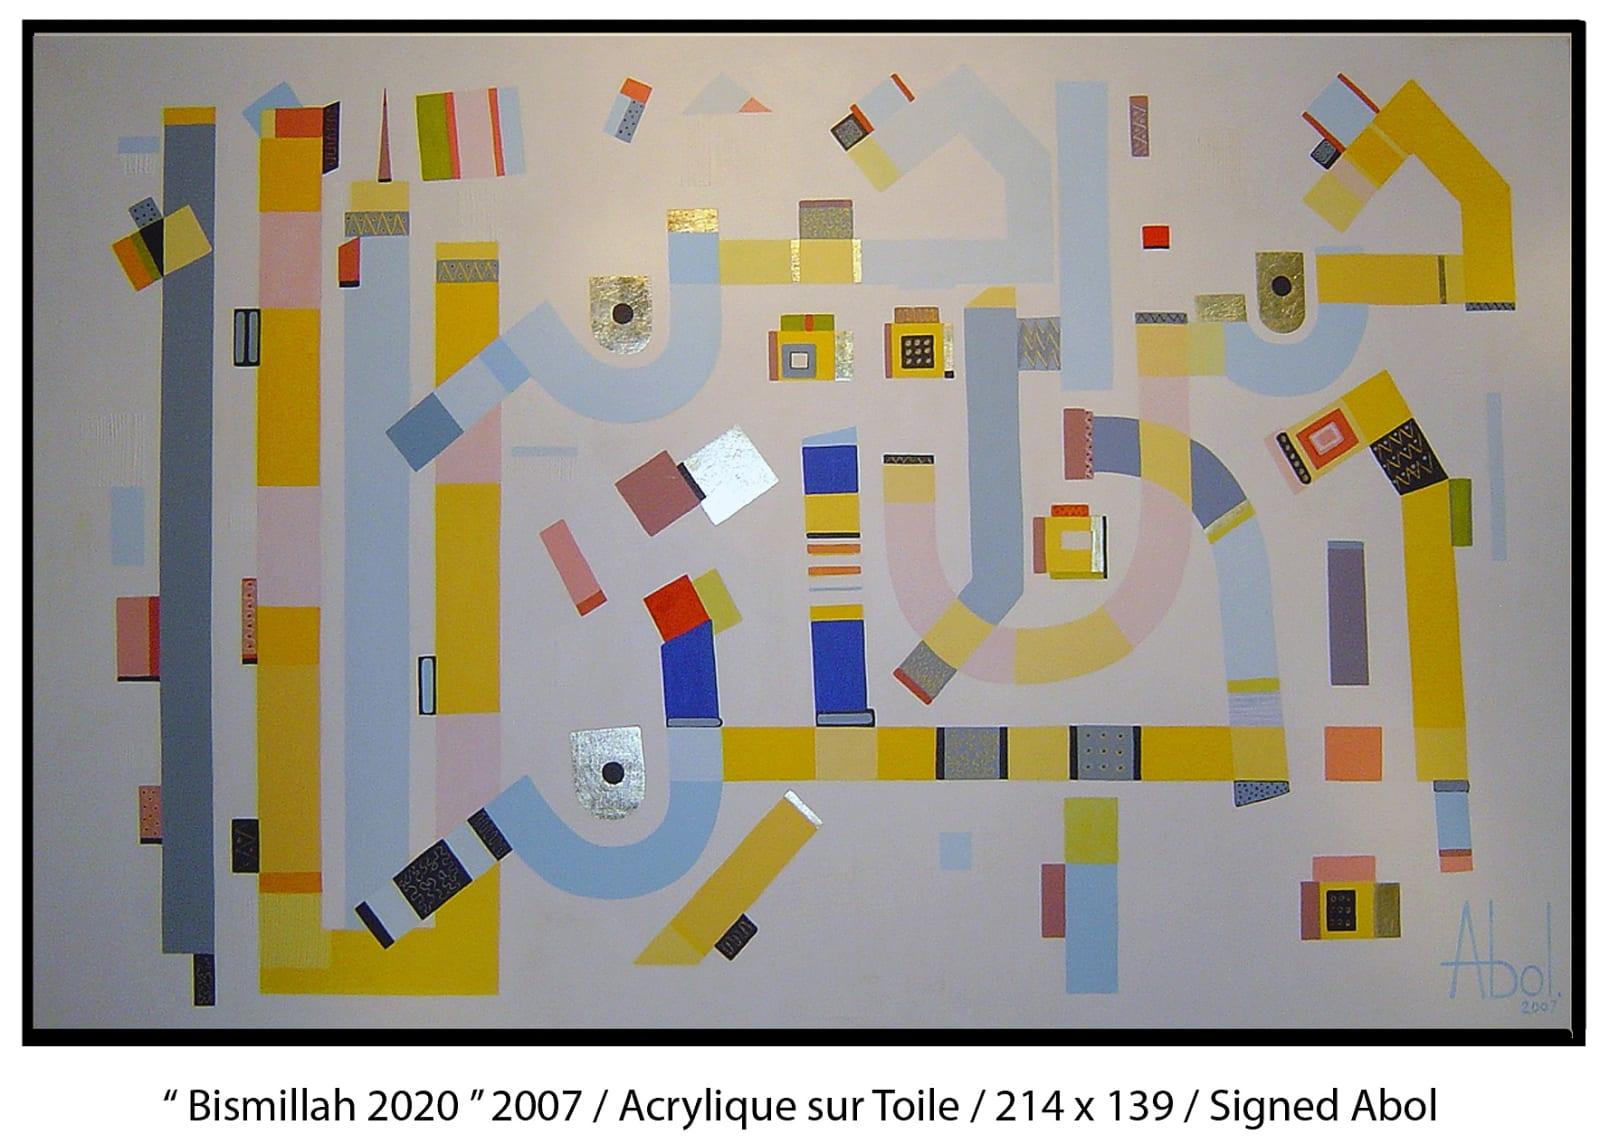 Abol Atighetchi, Bismillah 2020 (2007), Acrylic on canvas, 139x214